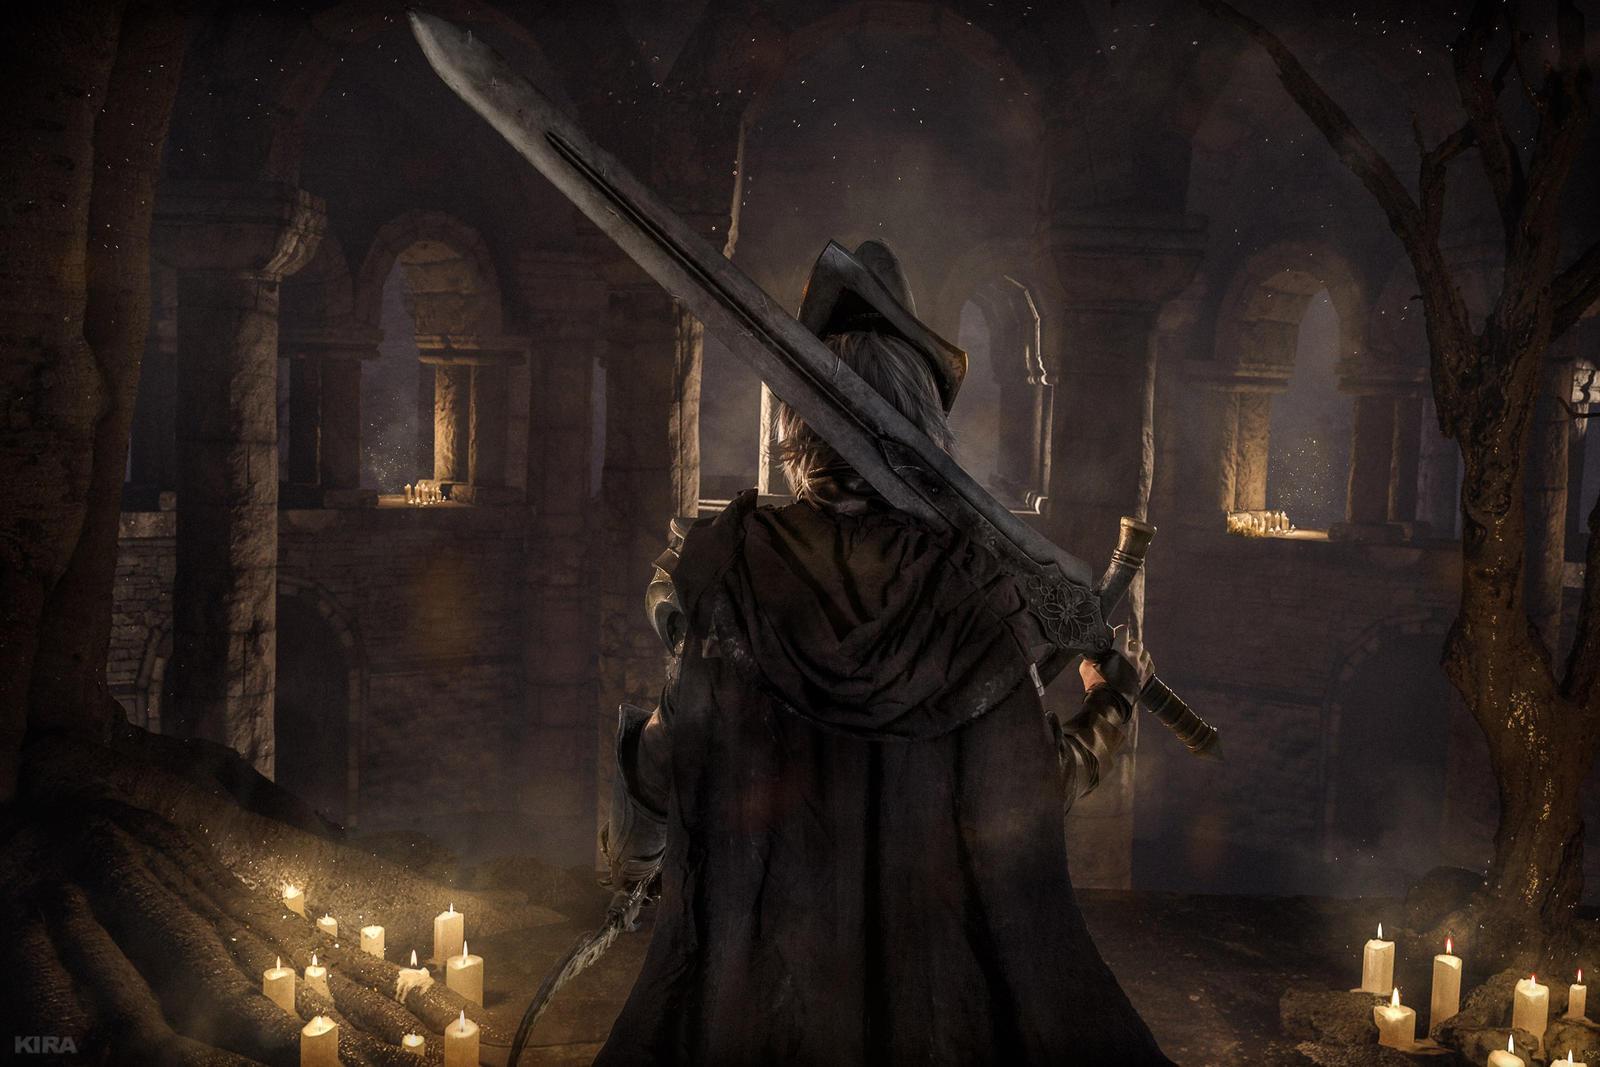 Dark Souls 3 Fire Keeper Cosplay: Dark Souls 3 Cosplay (Photo Story: Image 1) By Niamash On